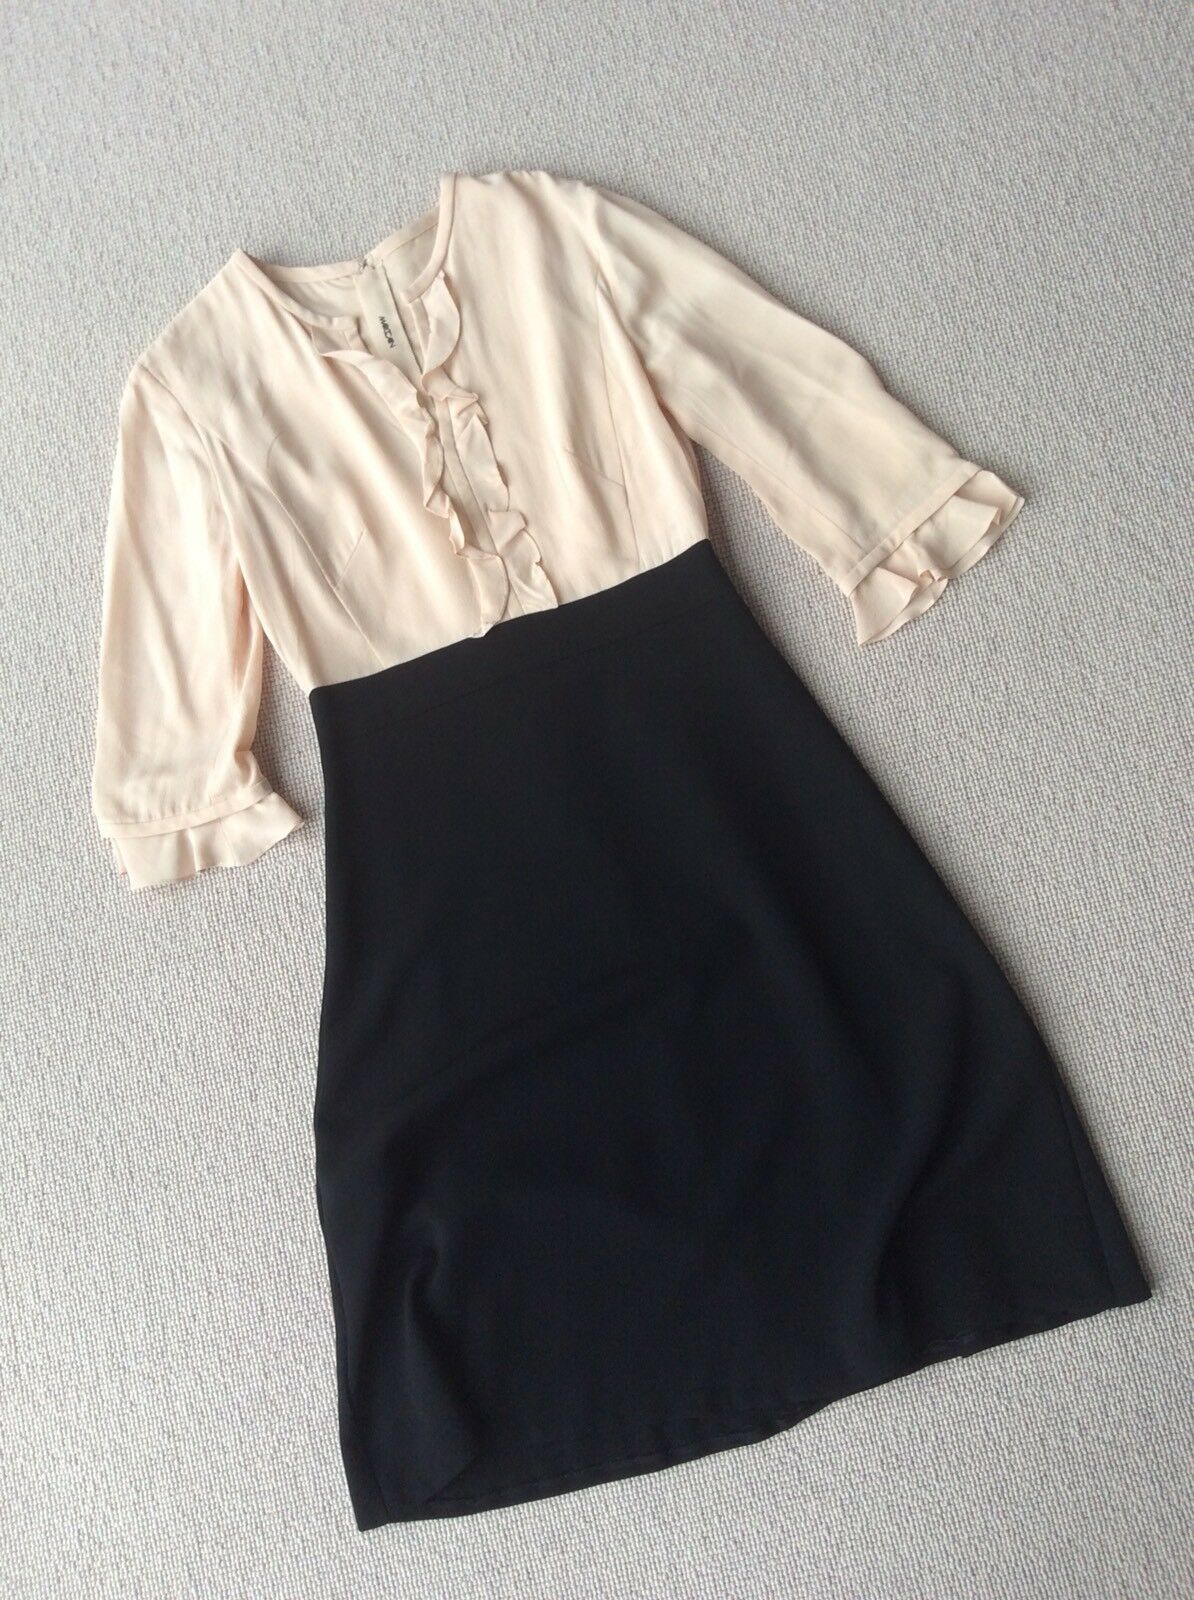 Elegant Designer MARCCAIN Blaush schwarz  Dress Größe UK10 RRP  Vgc